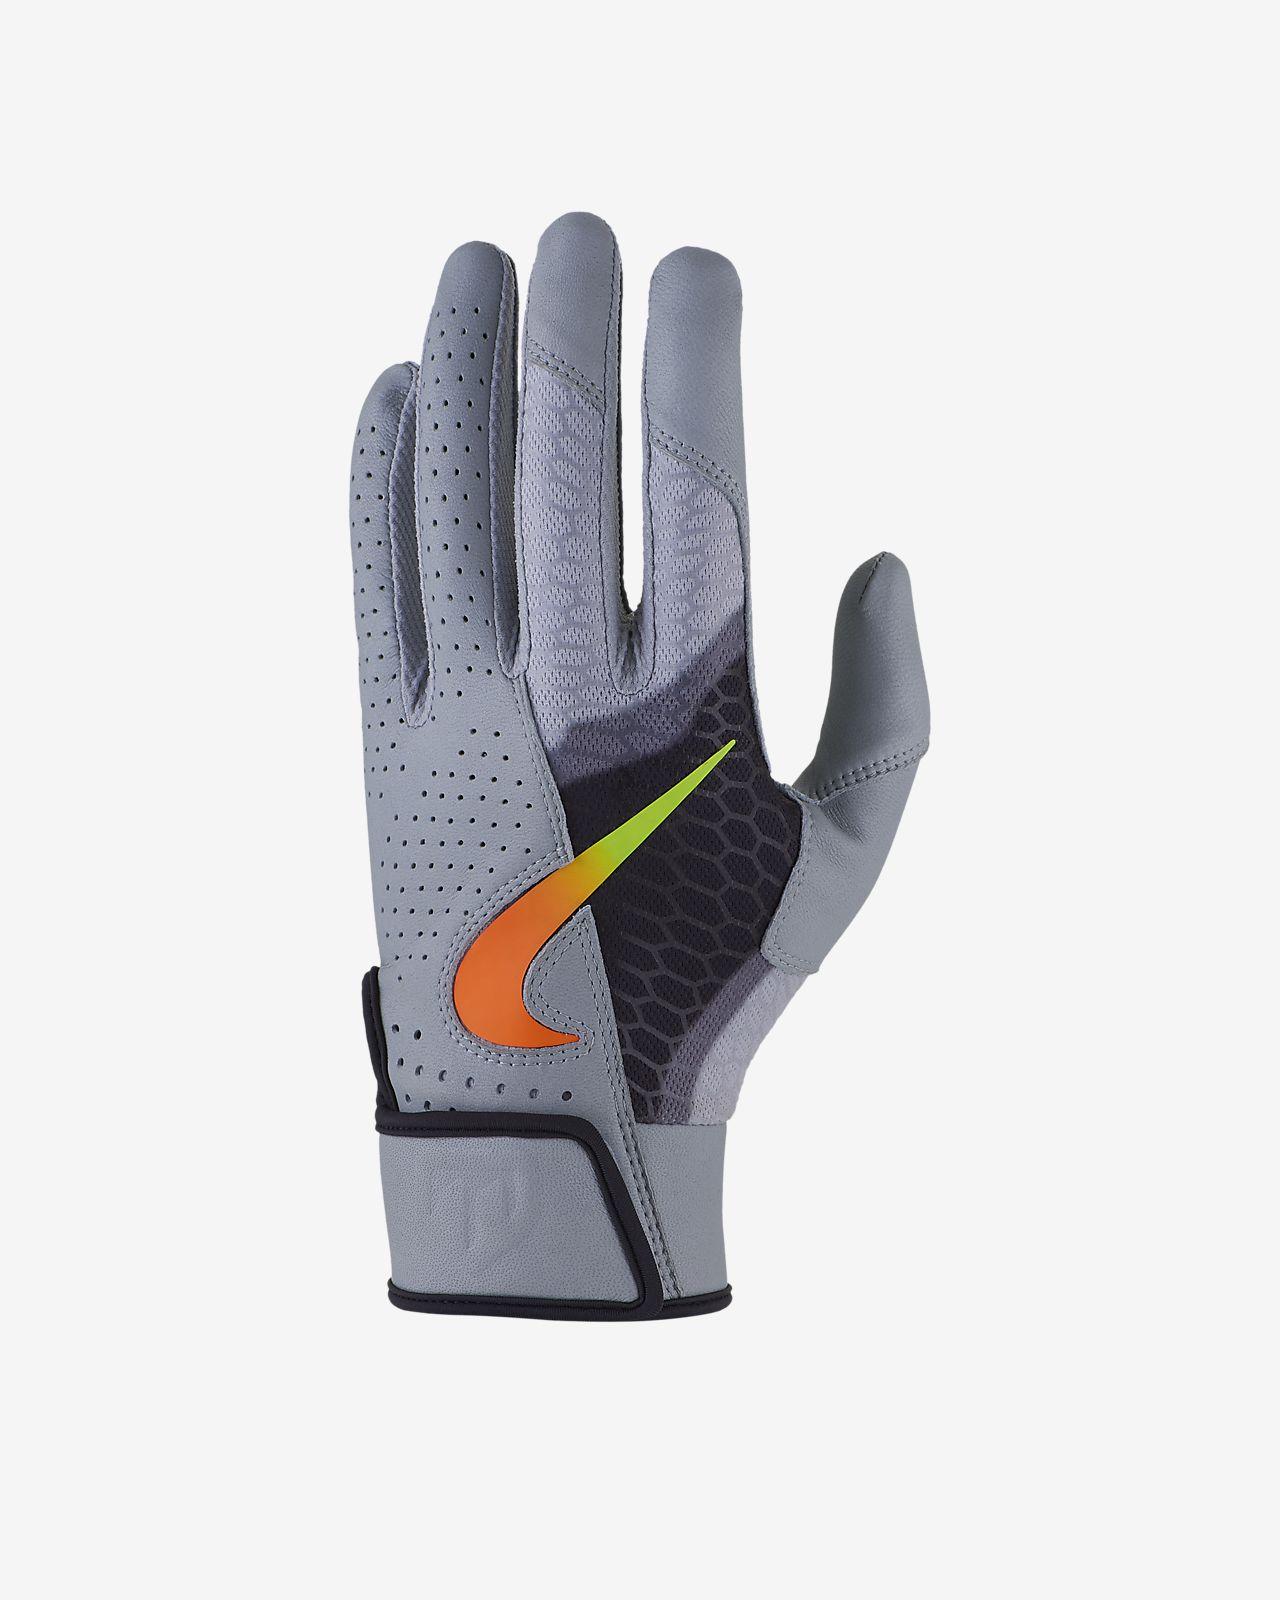 Nike Trout Elite 2.0  Baseball Batting Gloves